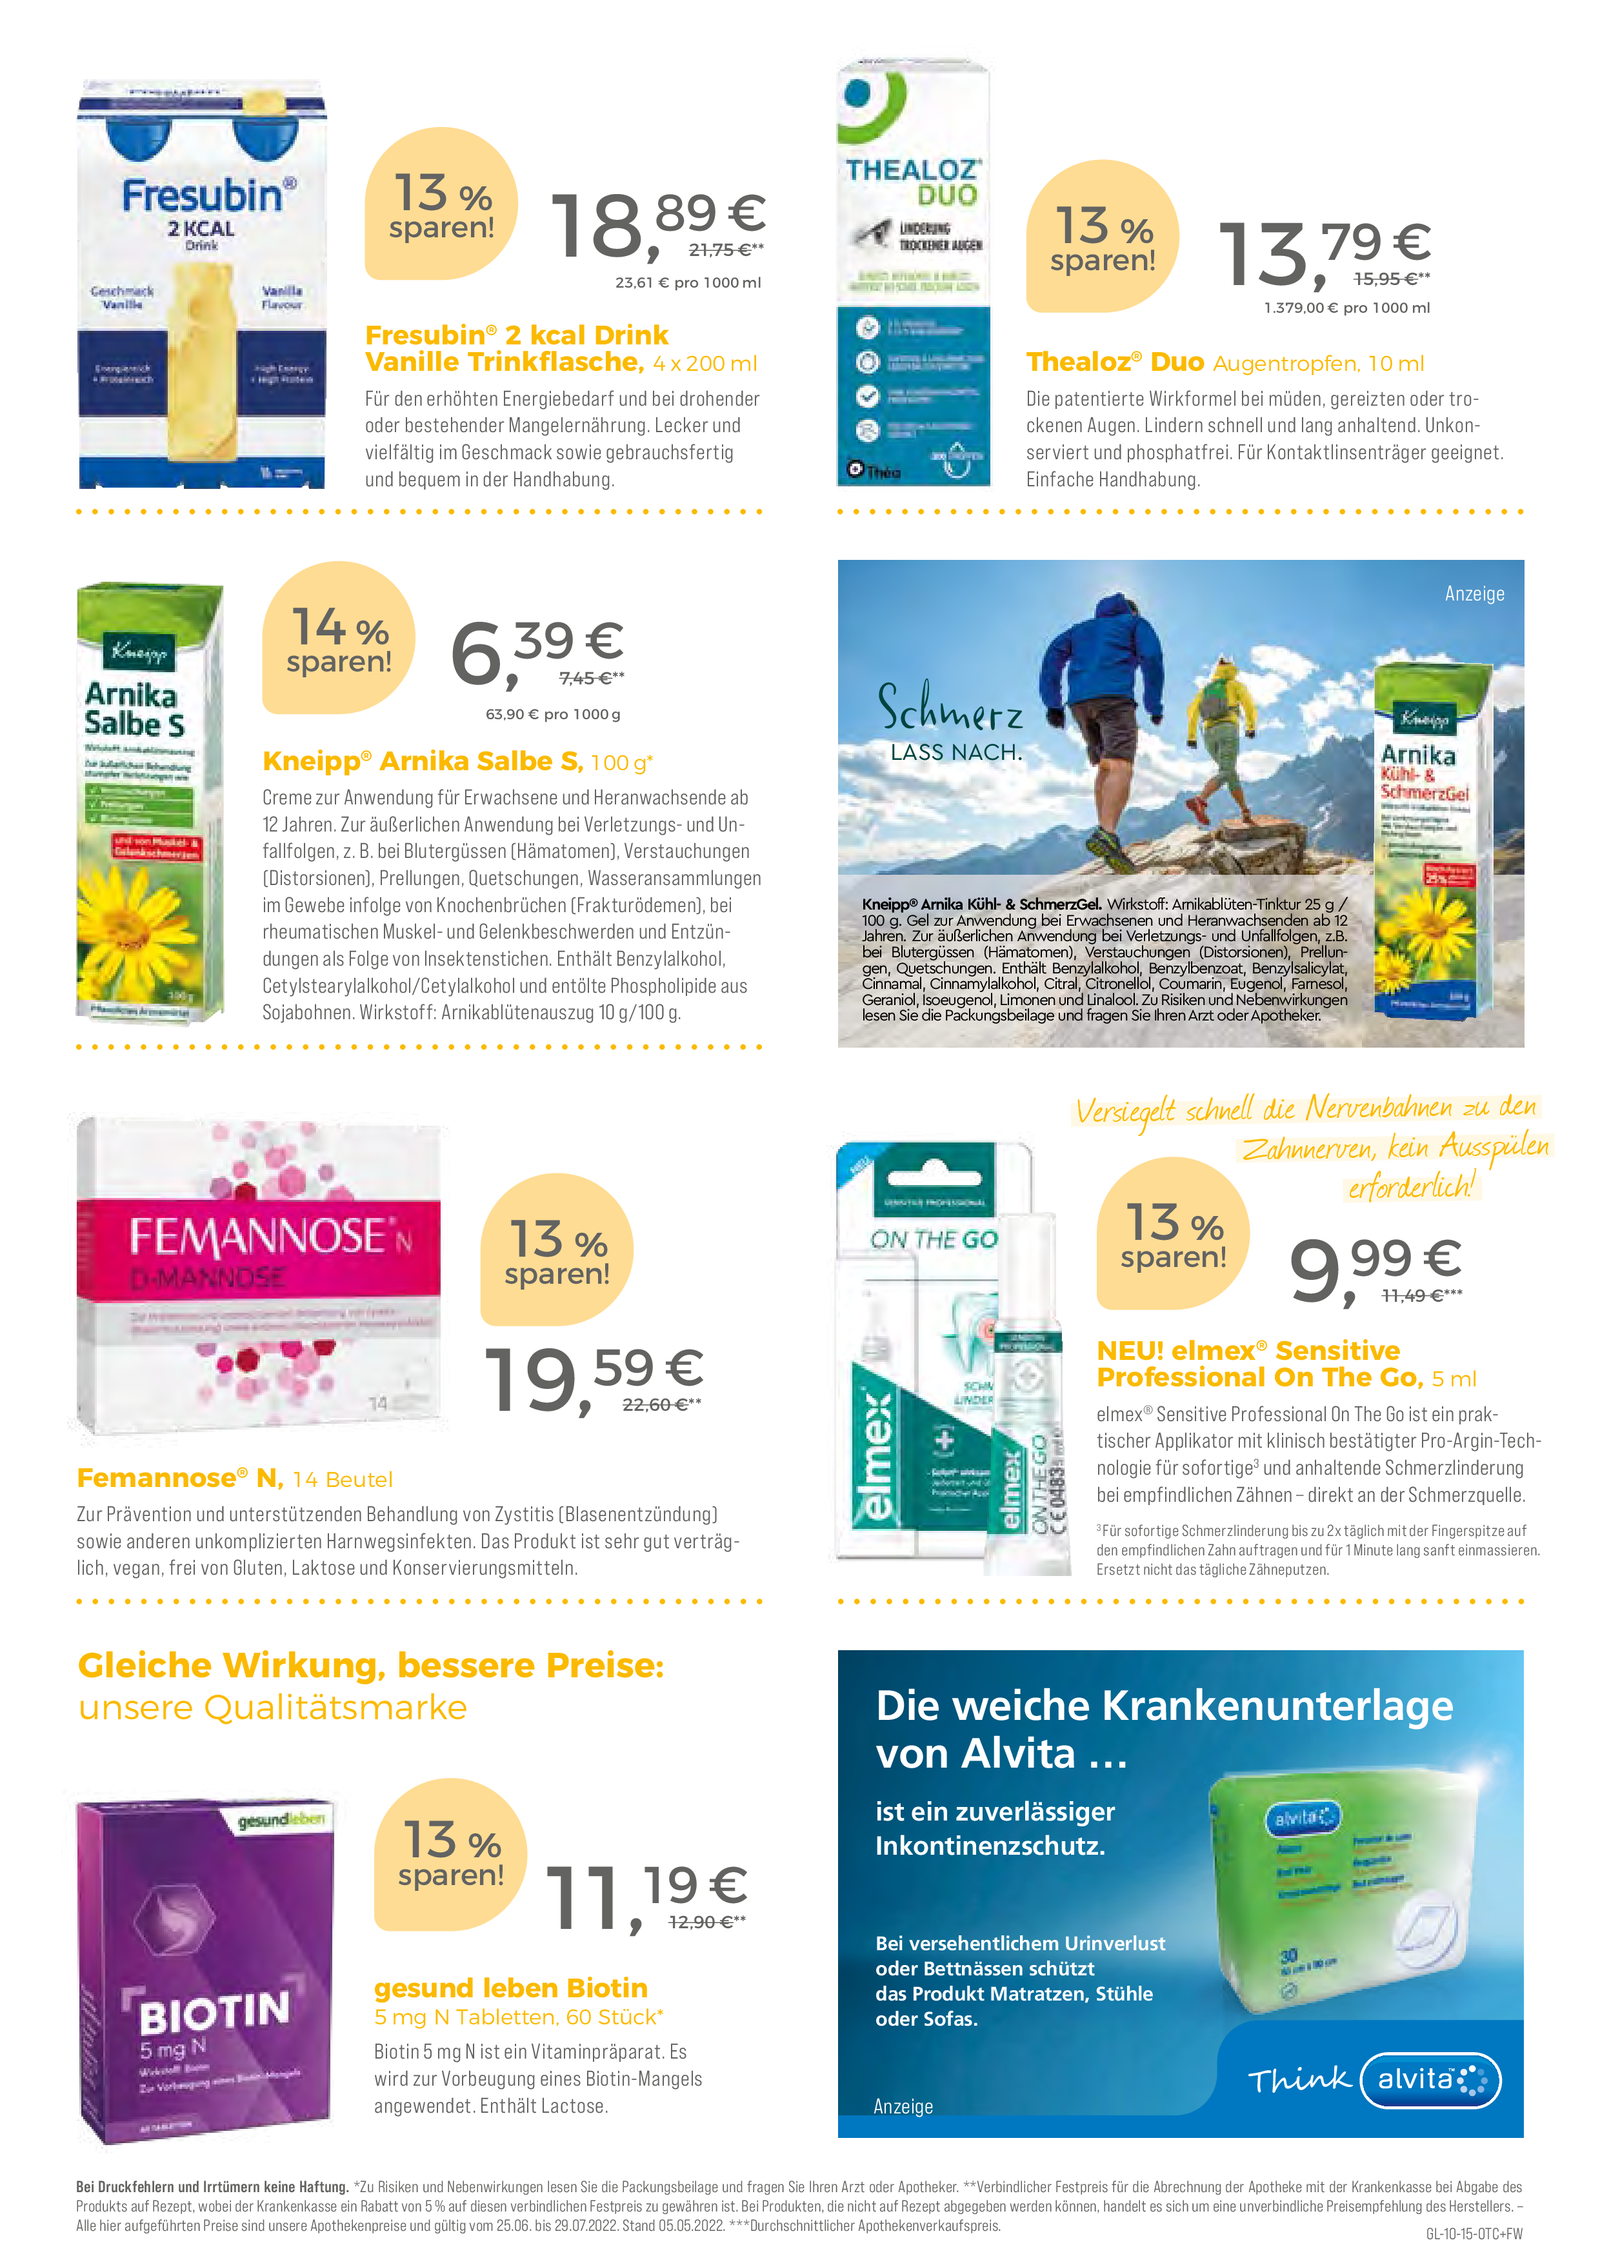 https://mein-uploads.apocdn.net/26520/leaflets/gesundleben_niedrig-Seite3.png